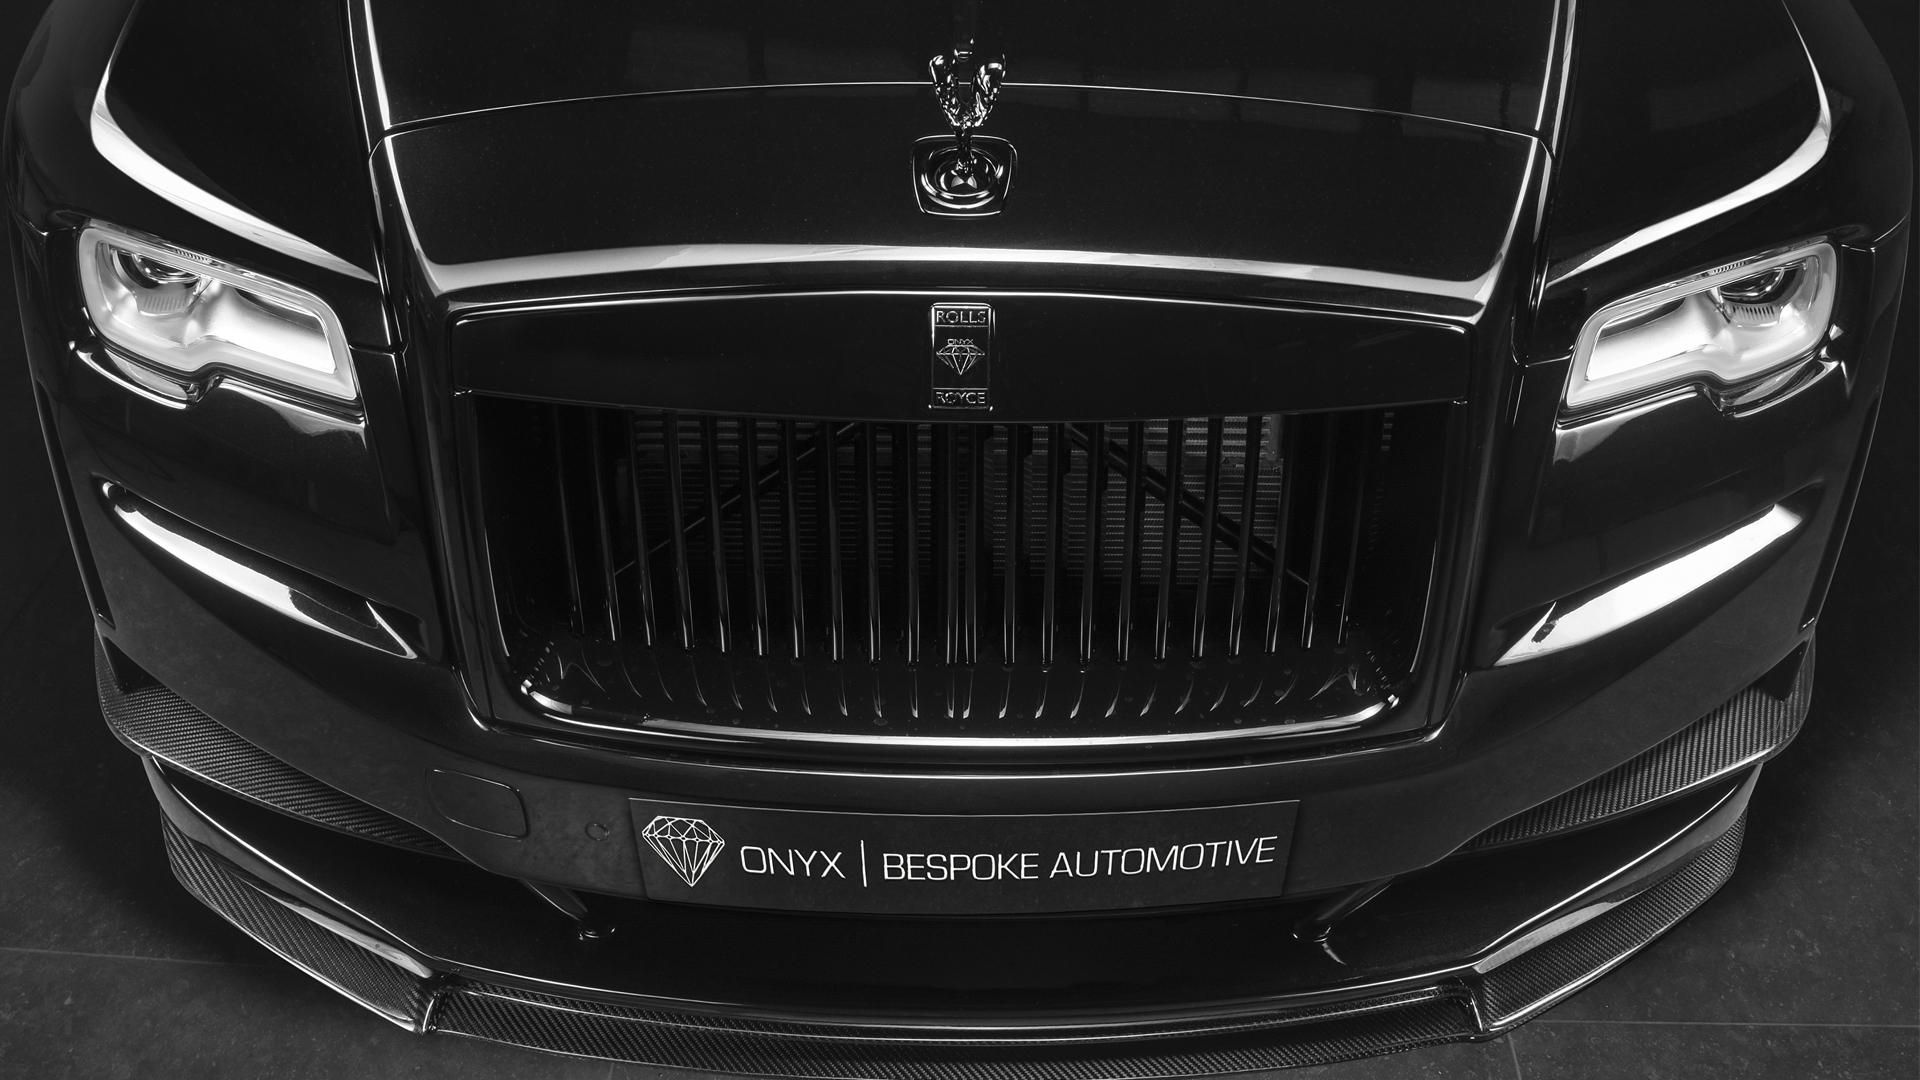 Onyx body kit for ROLLS ROYCE WRAITH new style